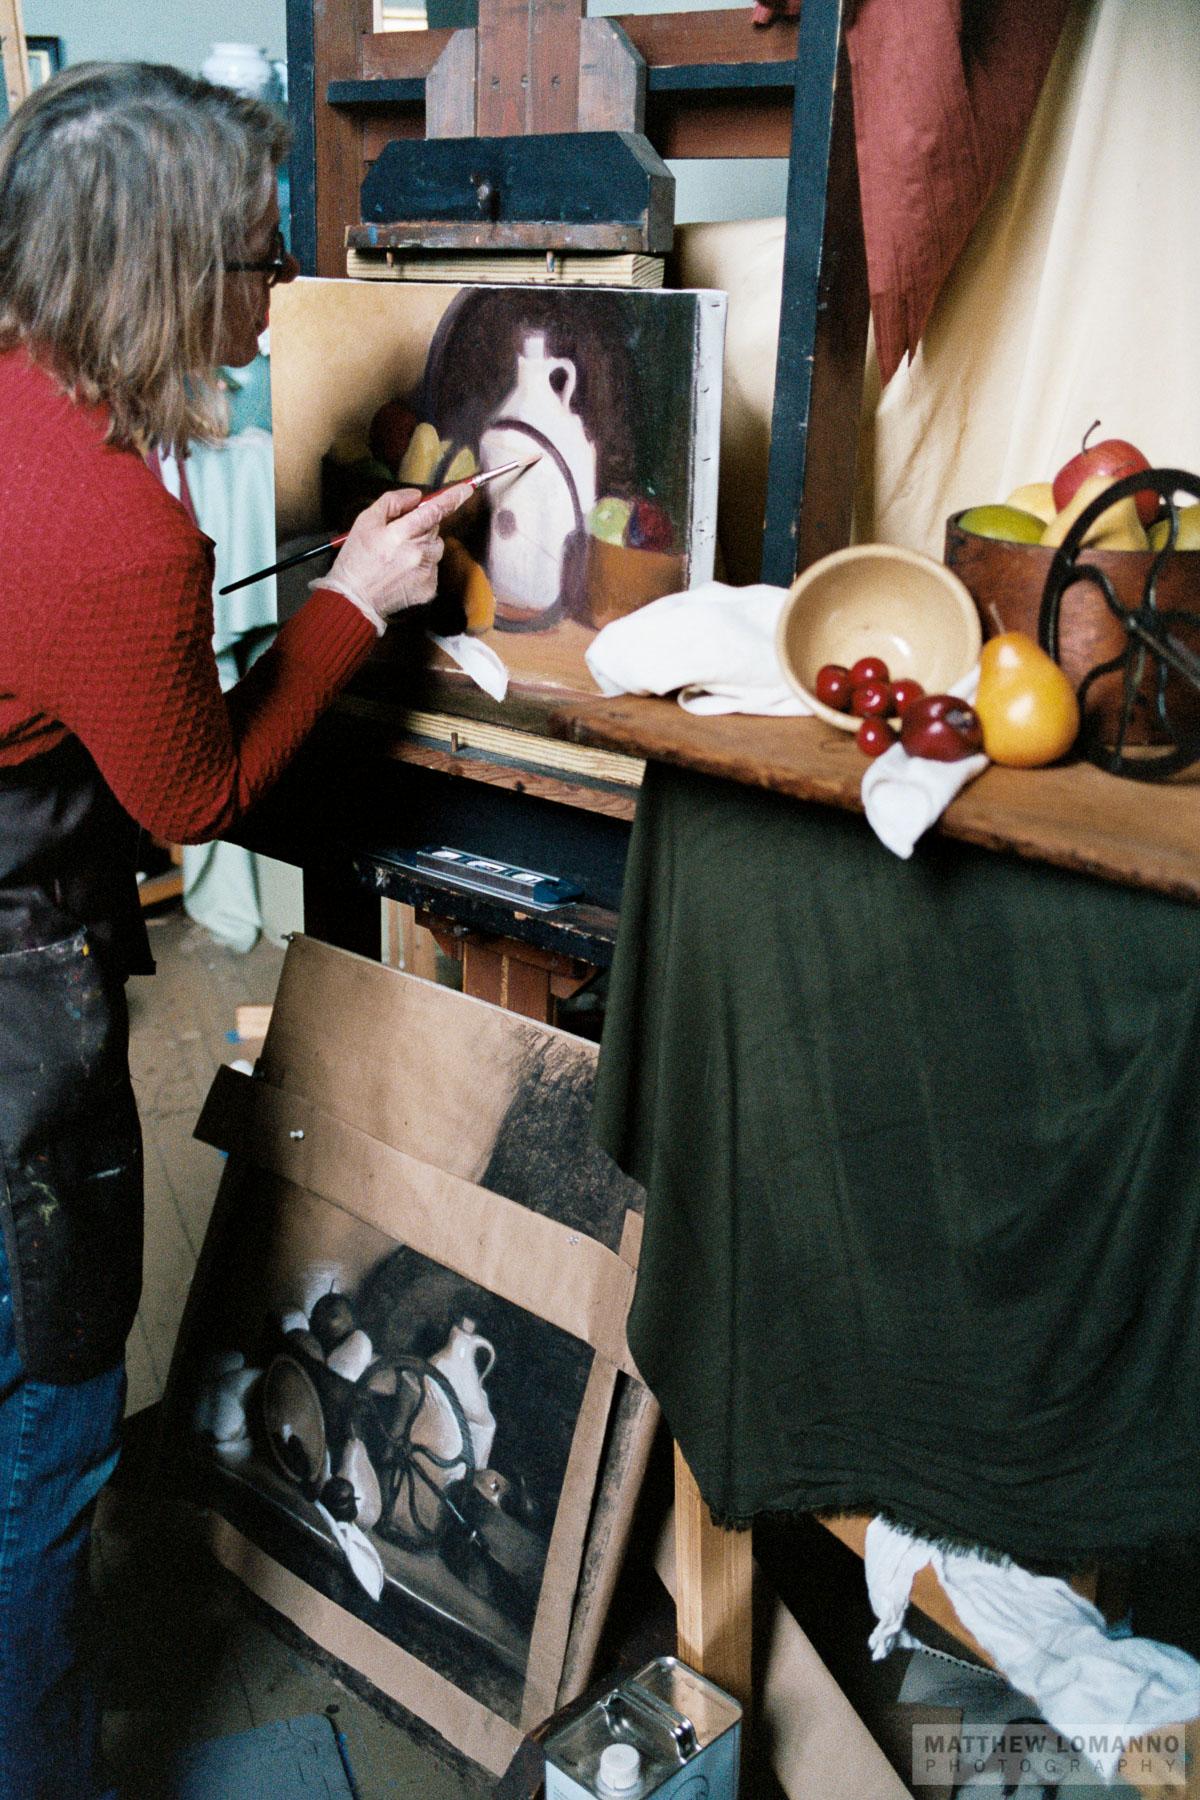 Ingbretson_atelier_working_by_Lomanno-4.jpg